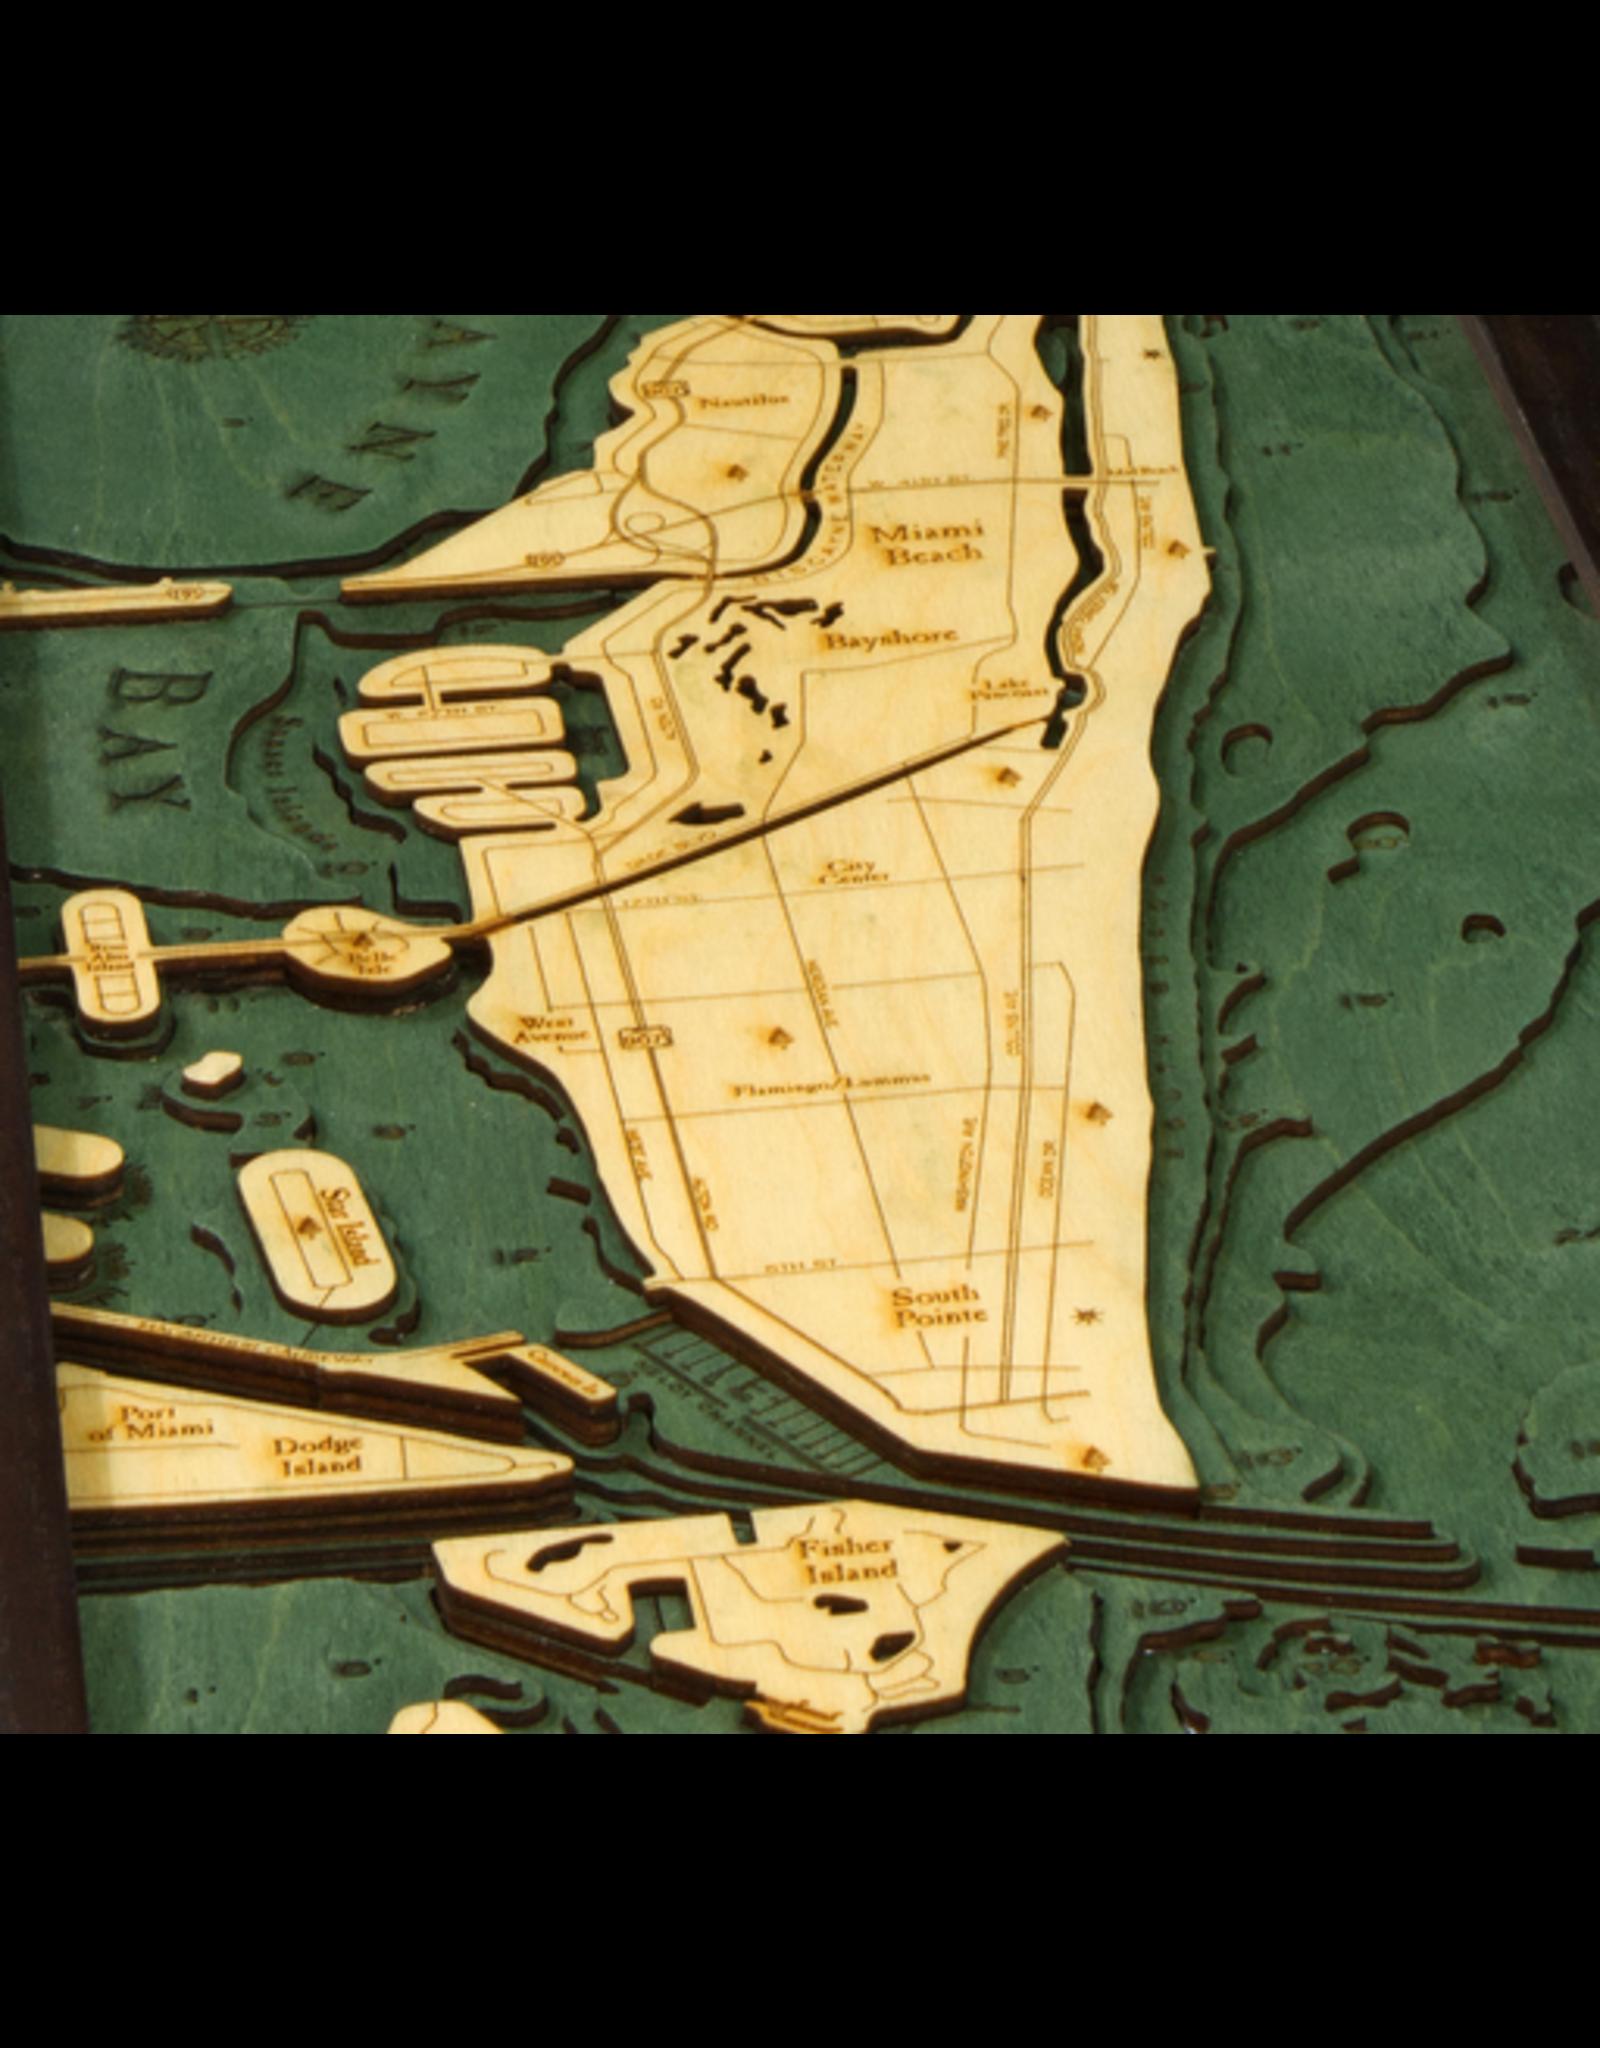 WoodCharts Miami Beach, FL (Bathymetric 3-D Nautical WOODCHART)